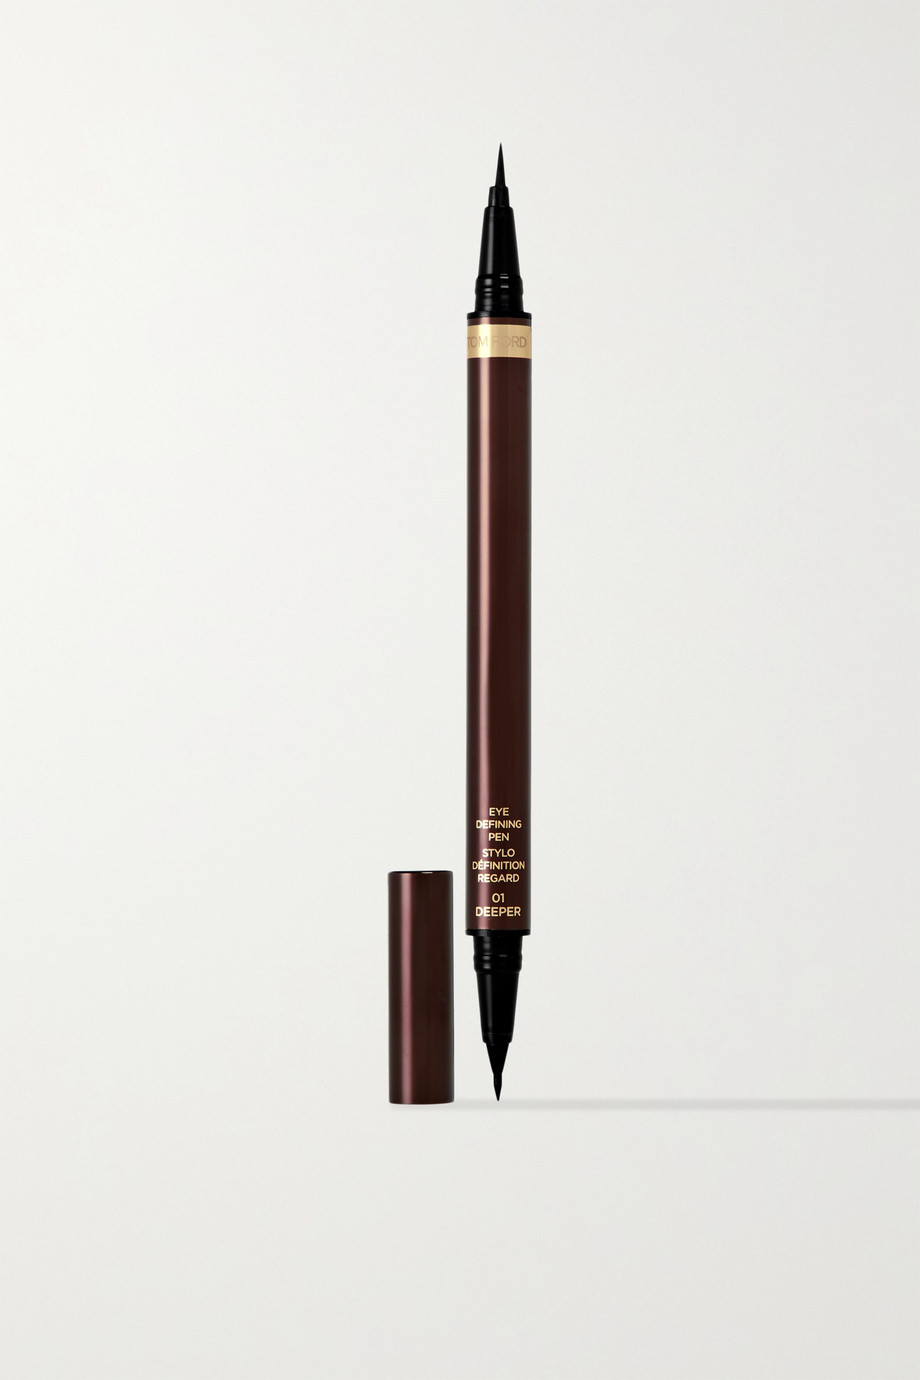 TOM FORD BEAUTY Eye Defining Pen – Deeper – Eyeliner